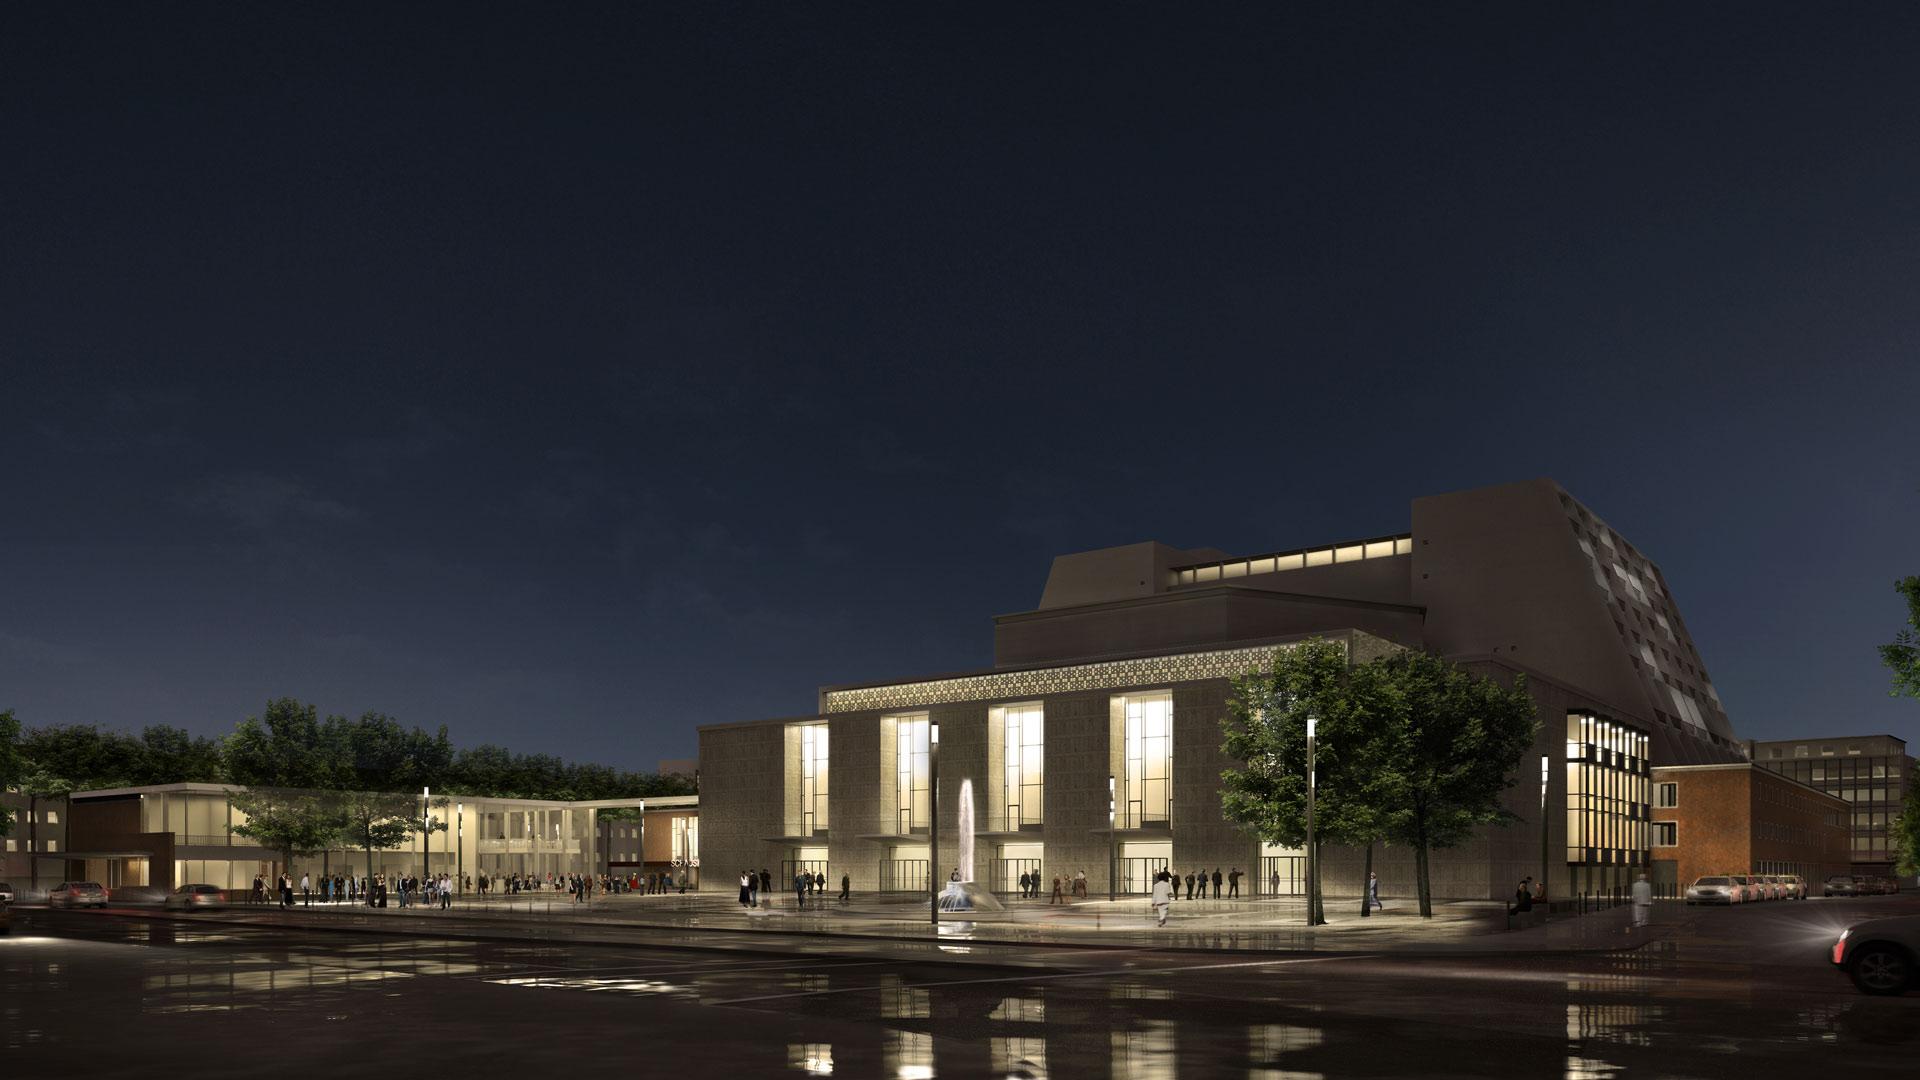 Lichtplanung Köln renovation opera house and theatre cologne kardorff ingenieure